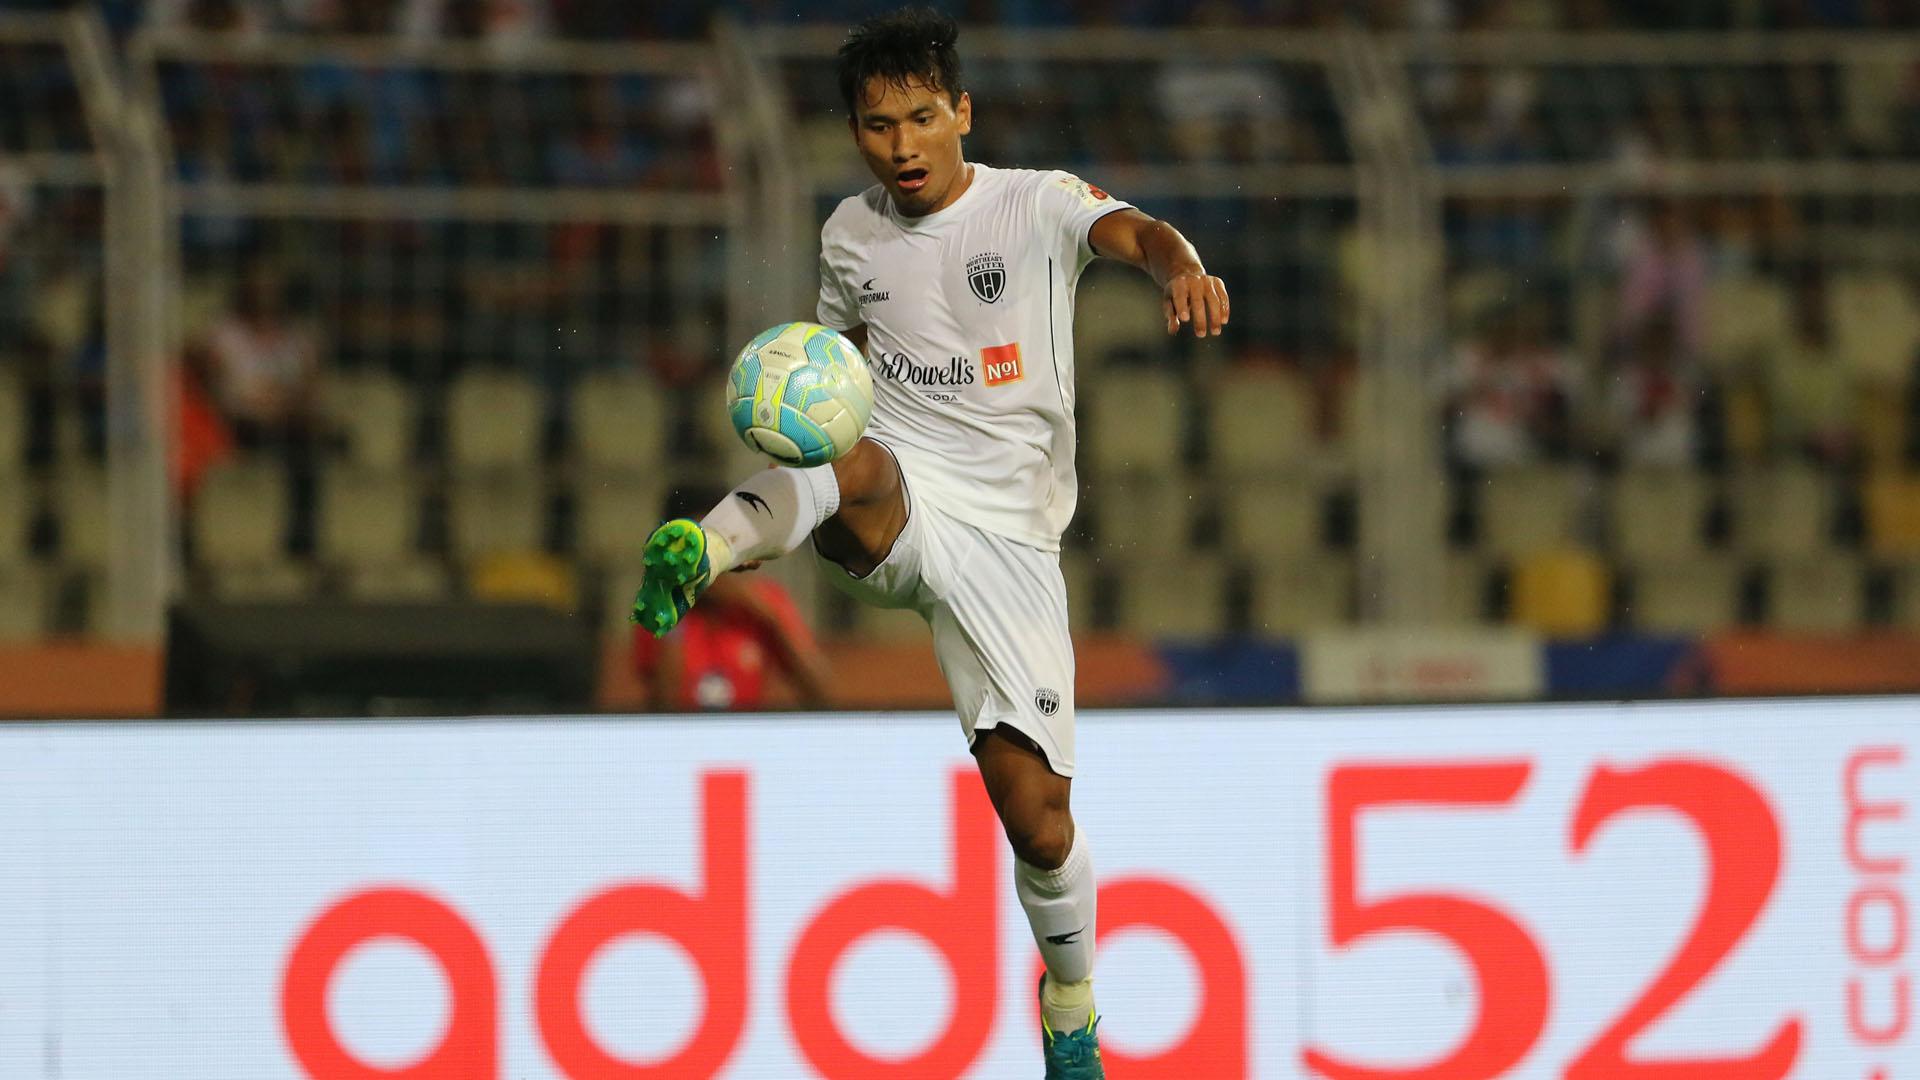 Seiminlen Doungel FC Goa NorthEast United FC ISL 4 2017/2018